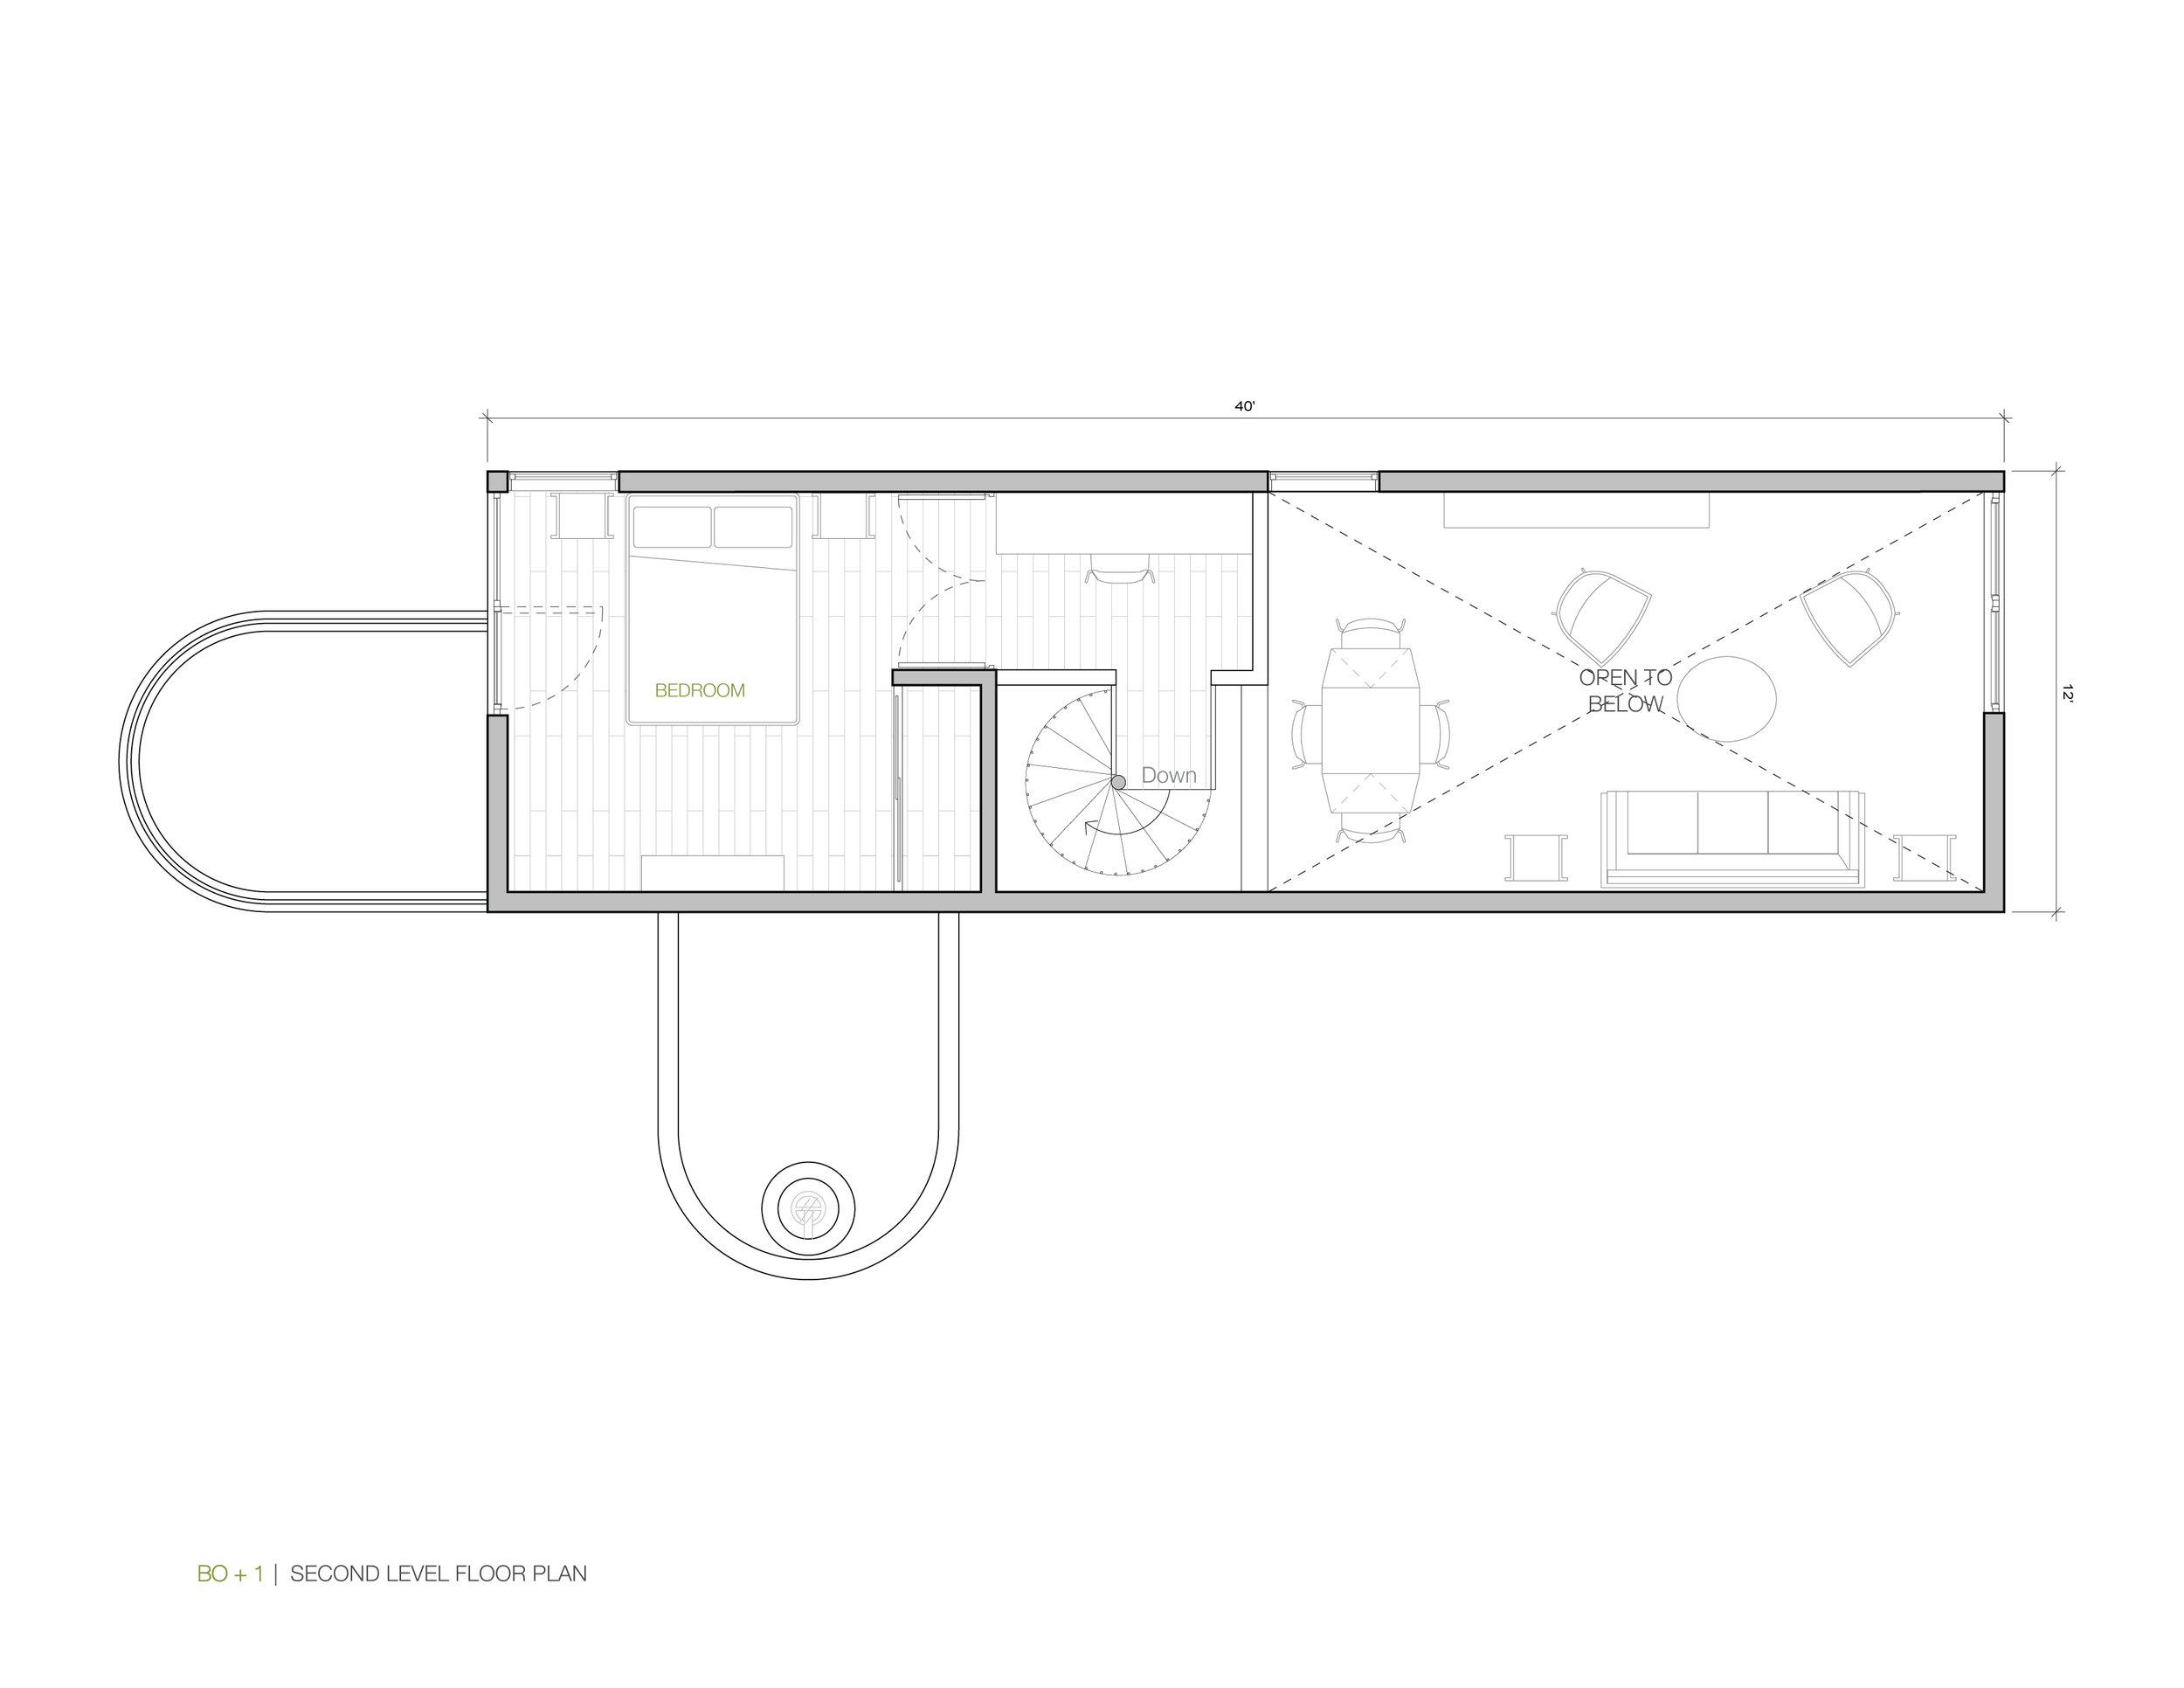 BO Floor plan-02.jpg